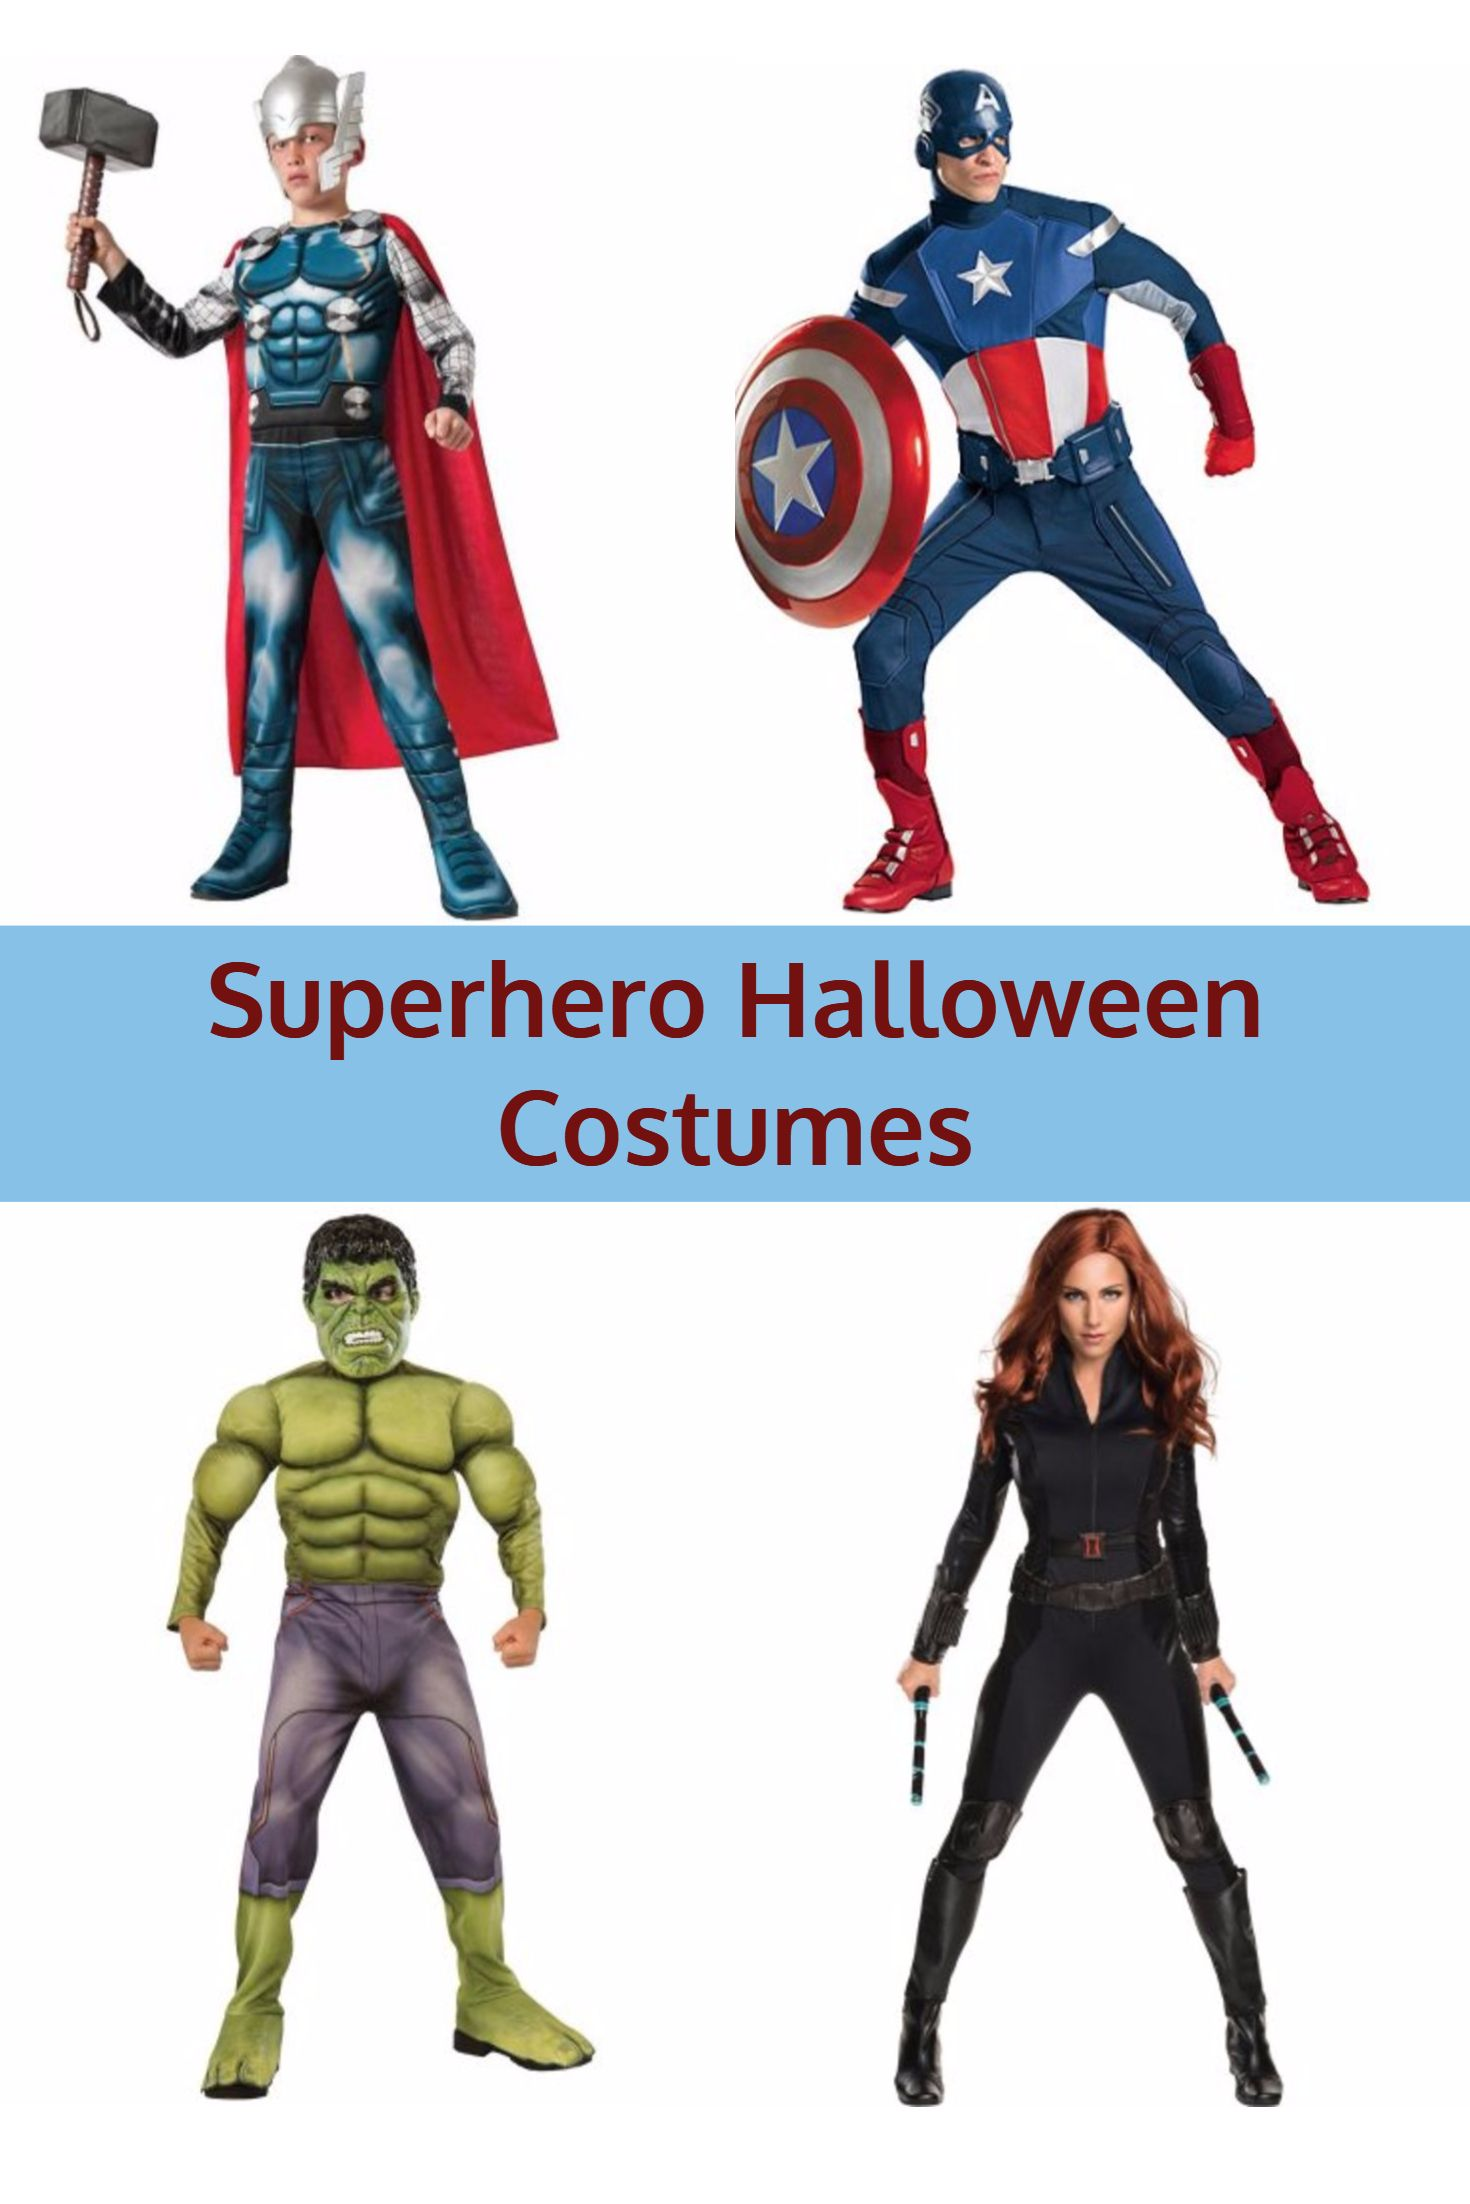 Superhero Halloween Costumes 2020 Best Avengers Superhero Halloween Costumes 2020 | Kims Home Ideas